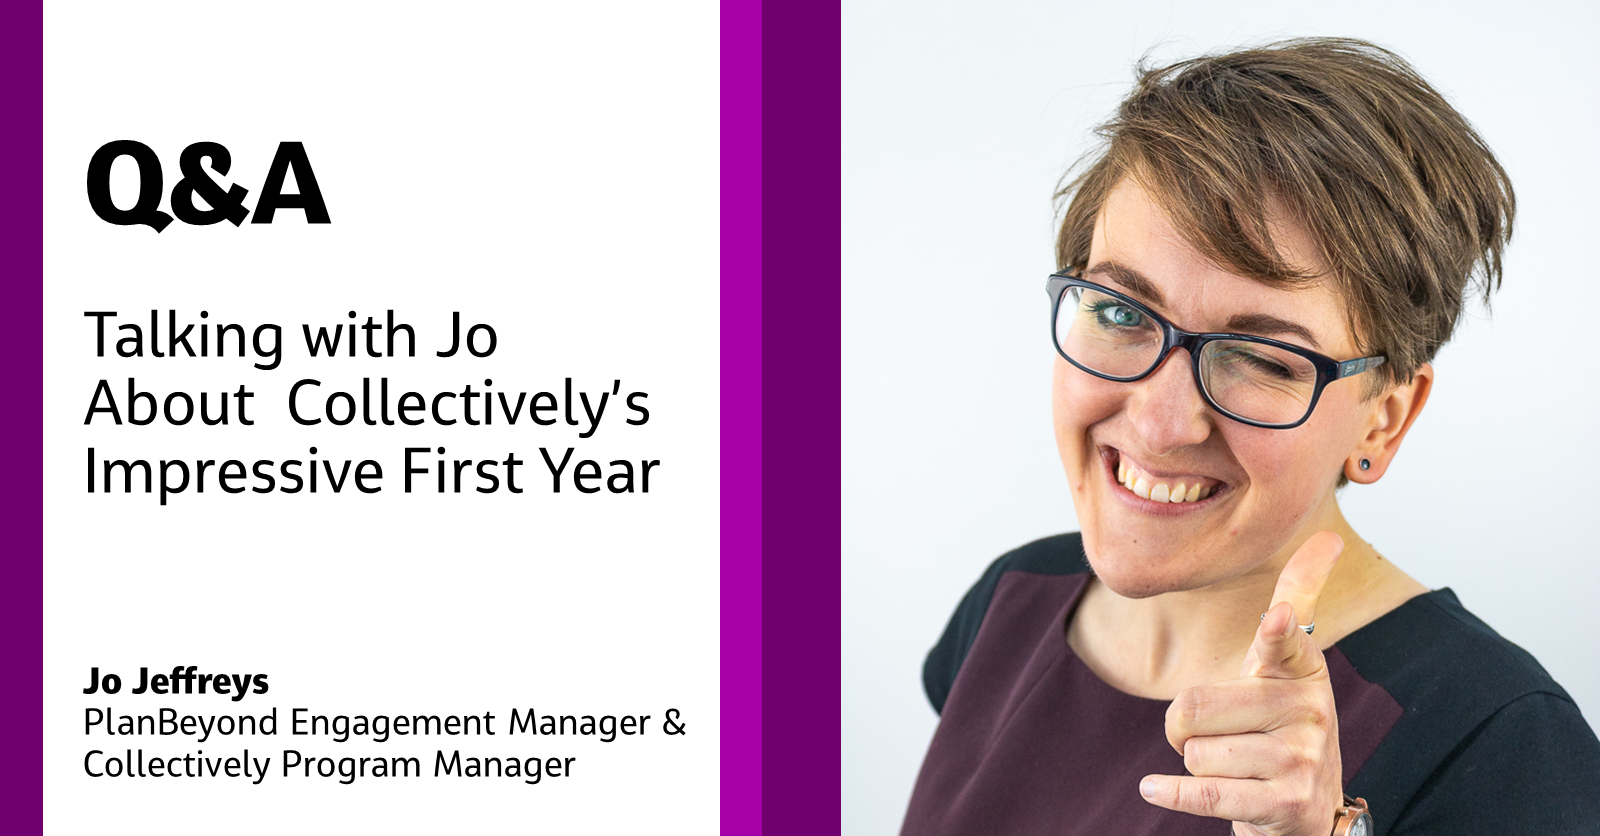 Jo Jeffreys, Collectively Program Manager